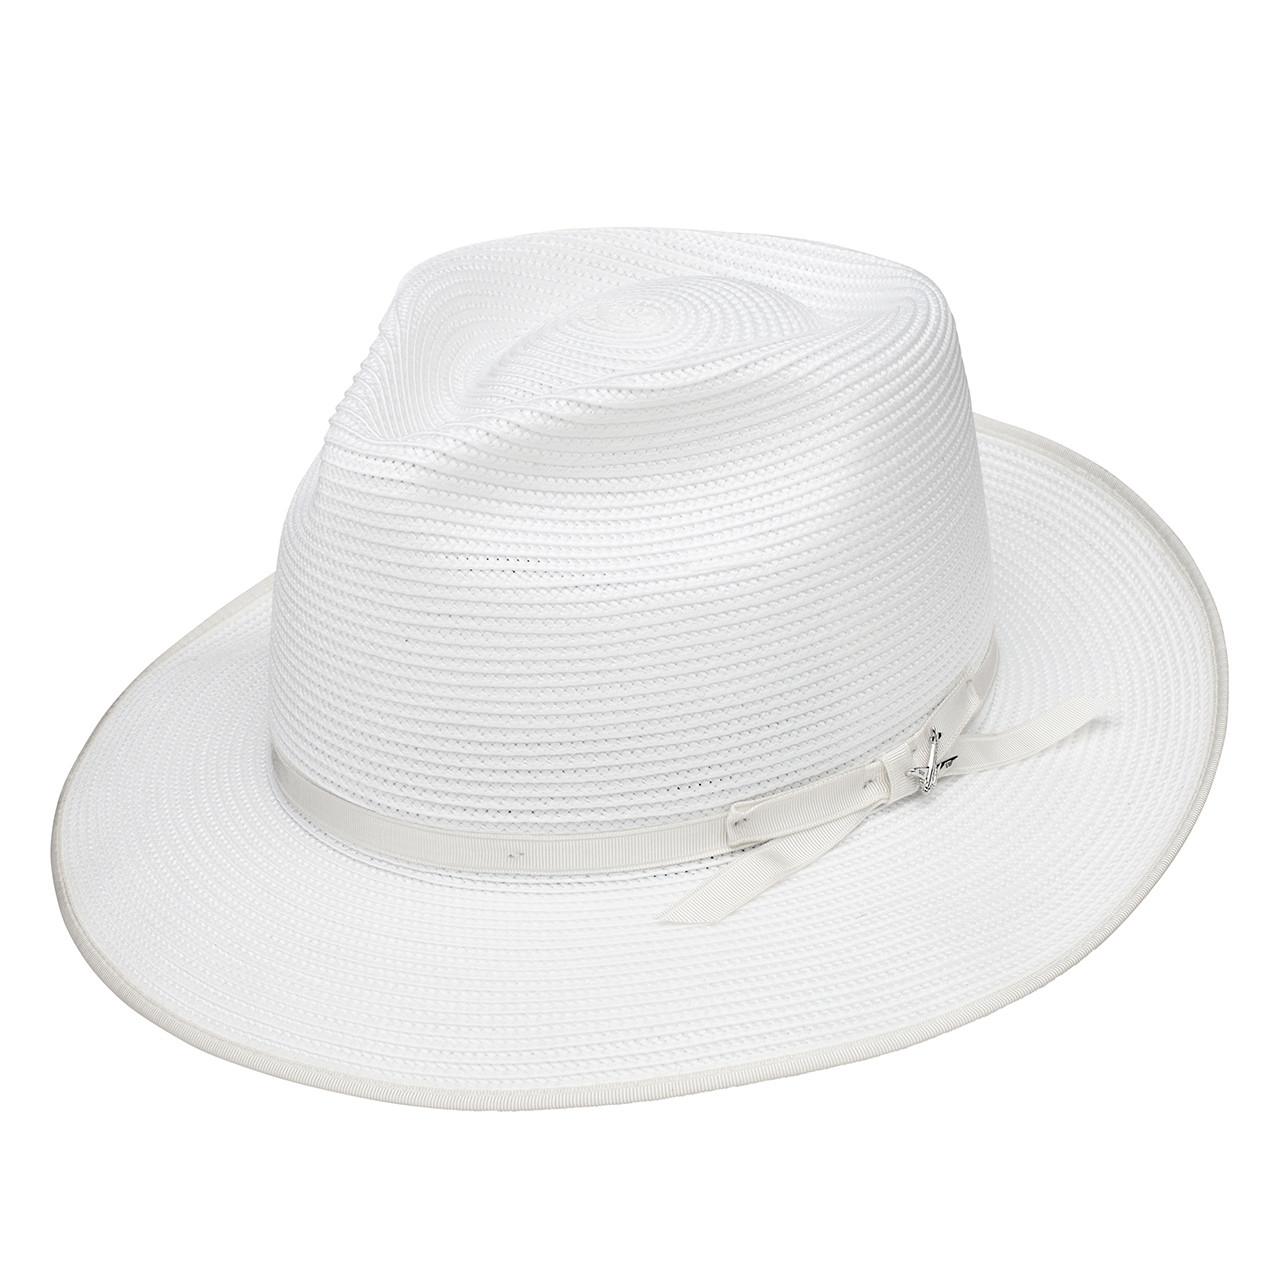 Stetson Stratoliner White Florentine Milan Firm Finish Straw Hat 139d504fb6c